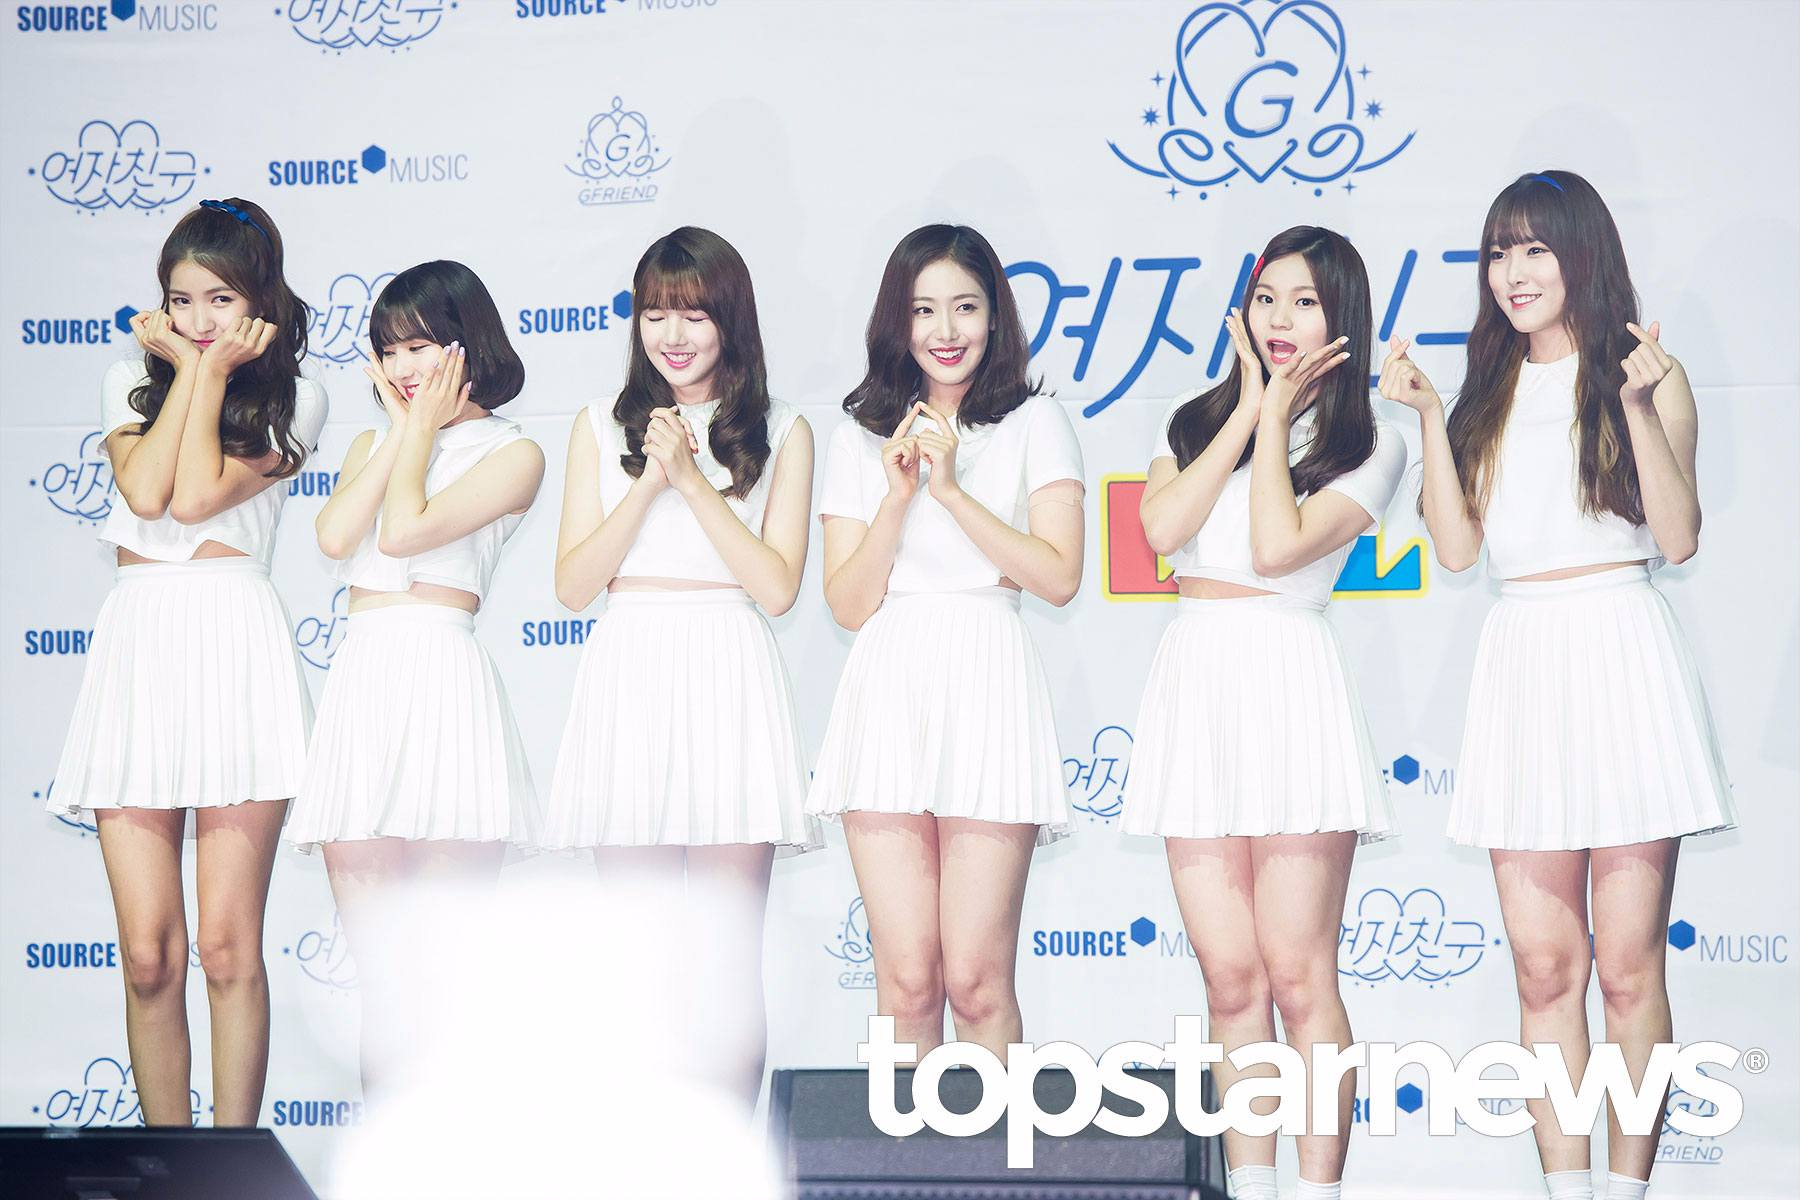 大家的小女友GFRIEND在7月11日帶著她們的第一張正規專輯《L.O.L》(Lots of Love/Laughing Out Loud)回歸韓國歌壇啦~